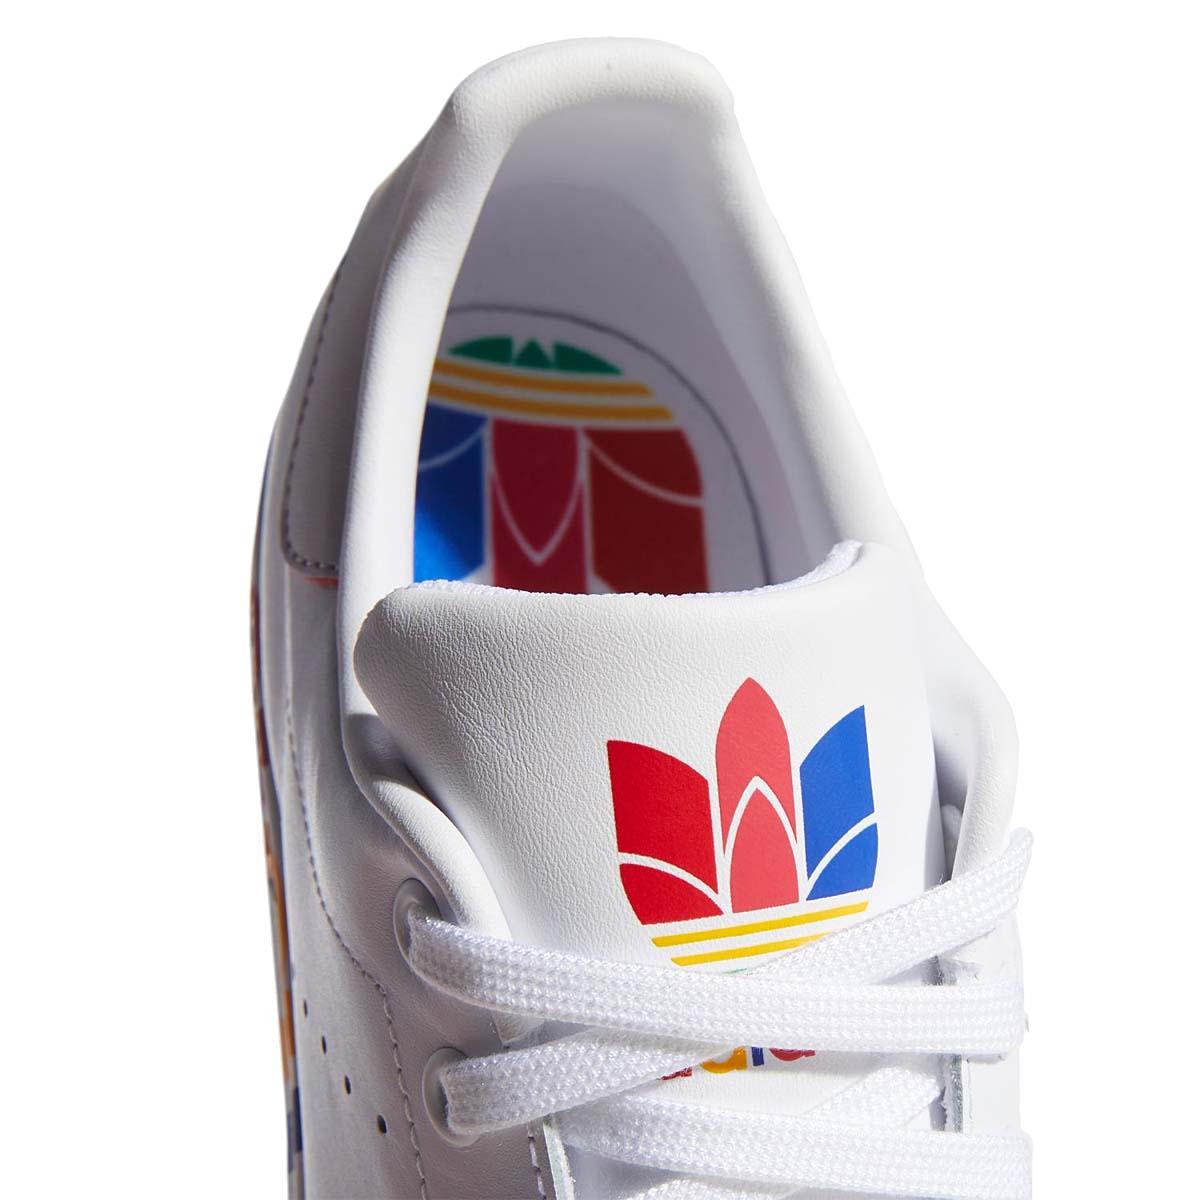 adidas Originals STAN SMITH FOOTWEAR WHITE / FOOTWEAR WHITE / TEAM ROYAL FY1146 アディダス オリジナルス スタンスミス ホワイト/マルチカラー